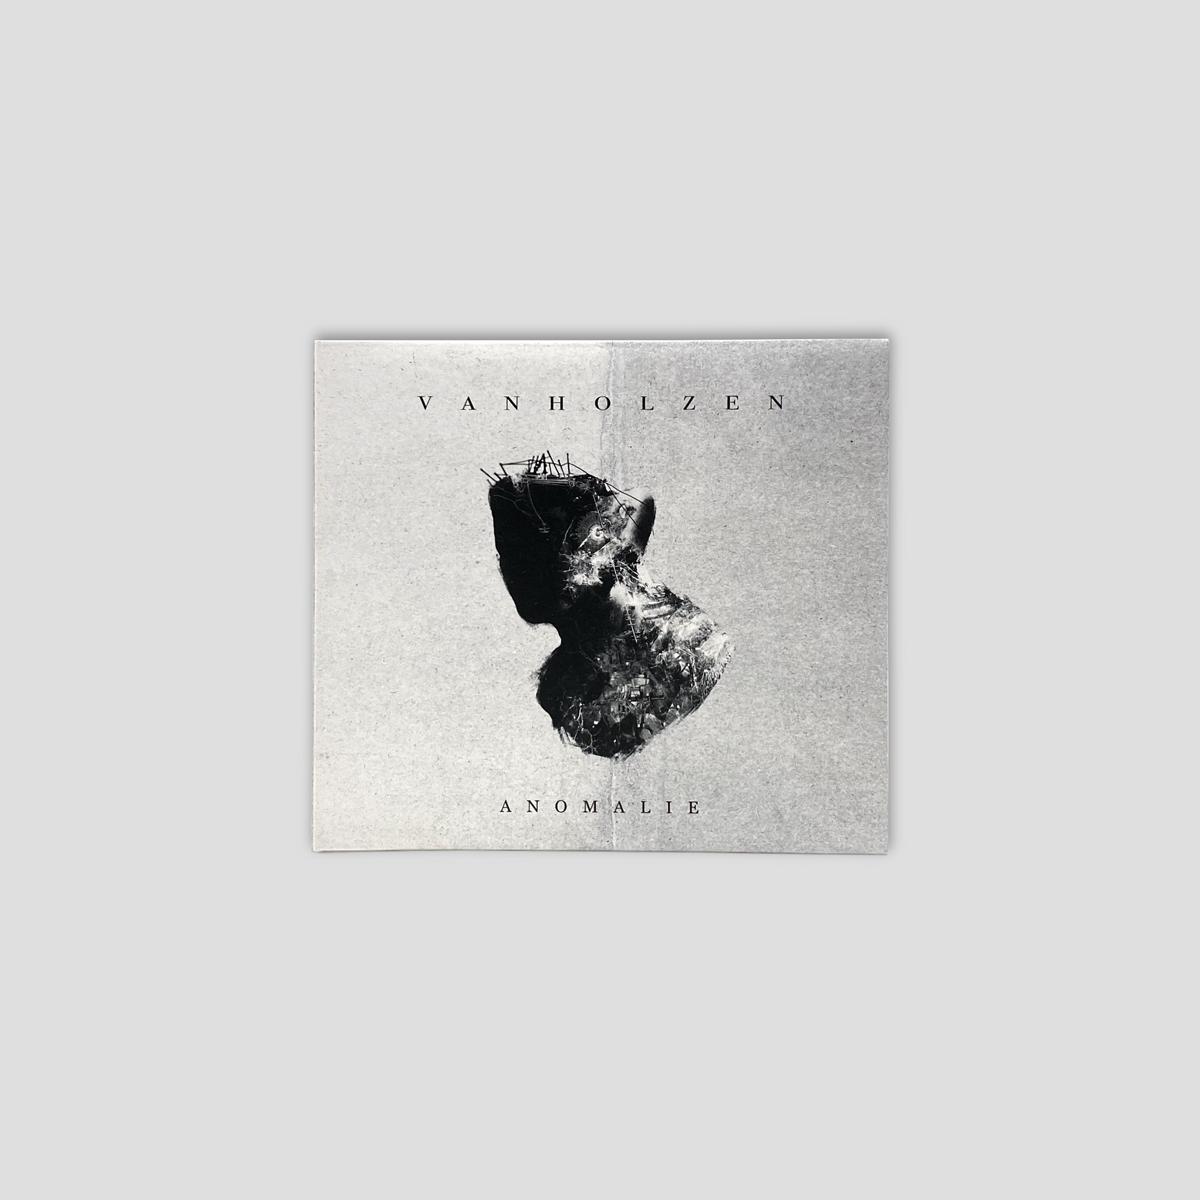 Anomalie CD Ansicht Cover